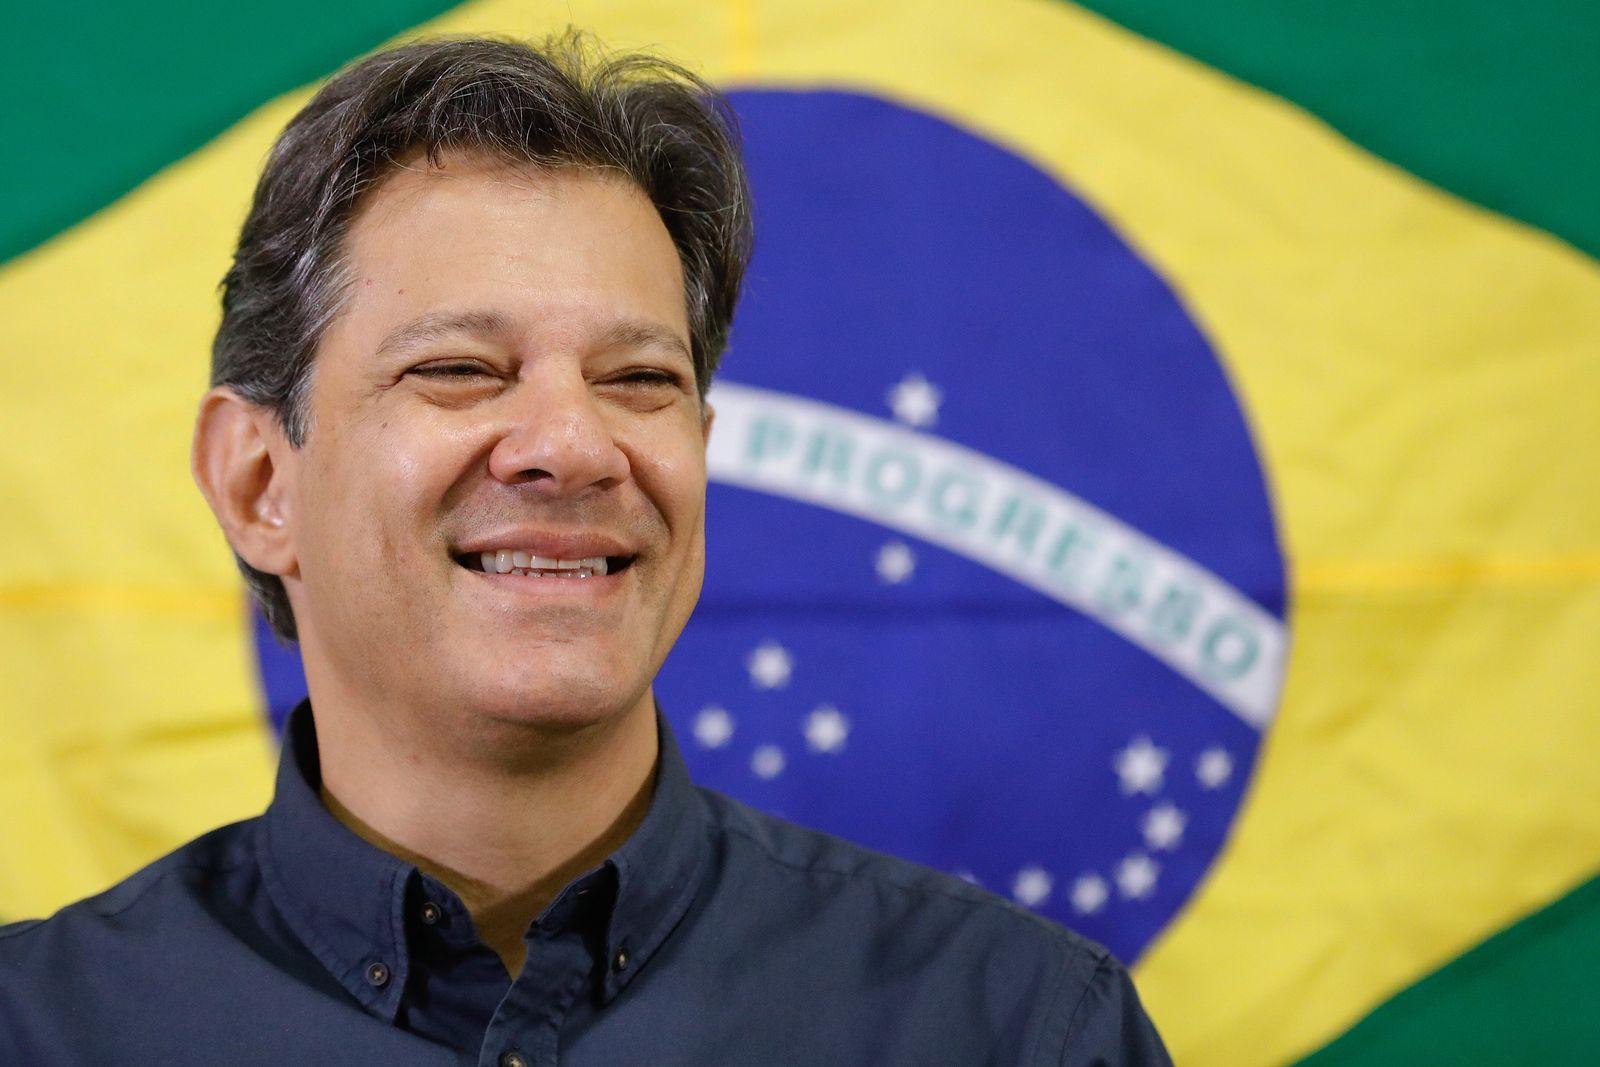 Fernando Haddad / Arbeiterpartei